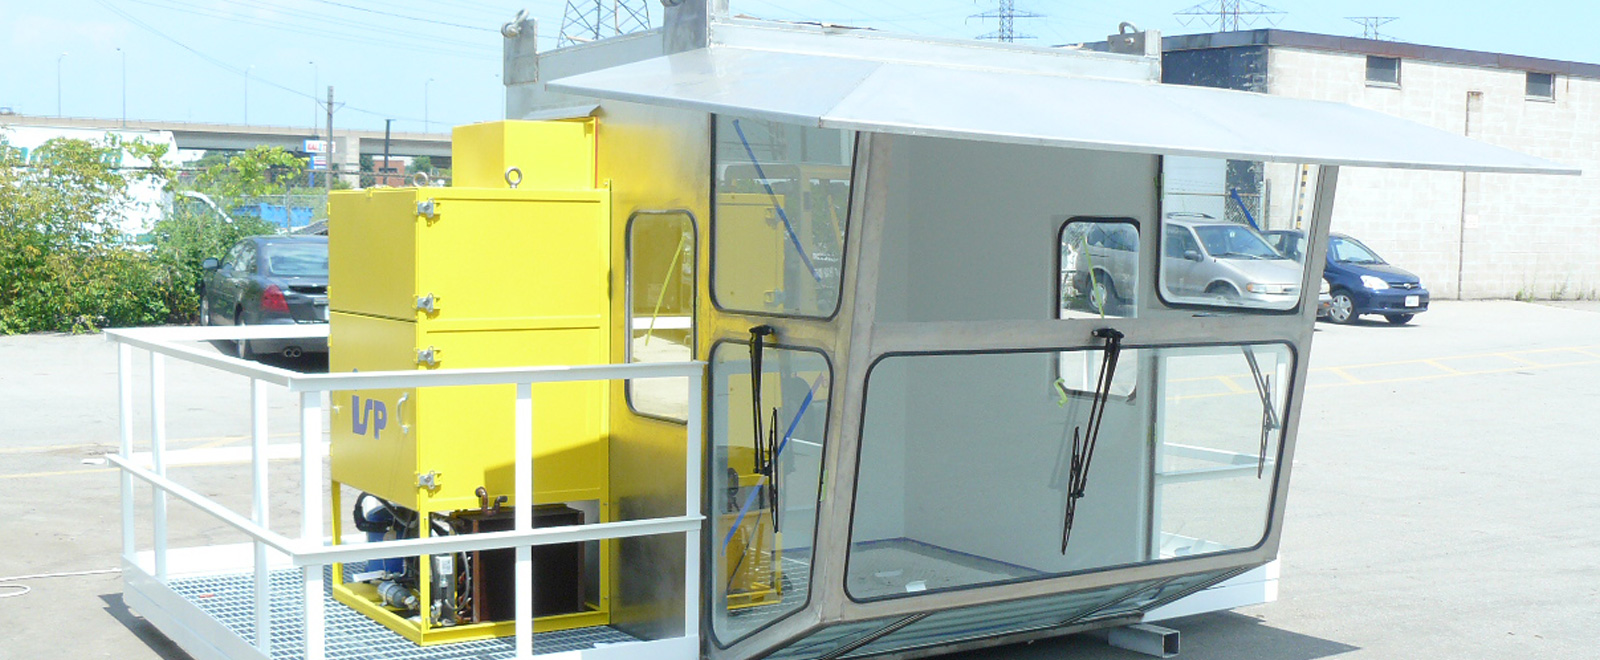 Crane Cab Header images